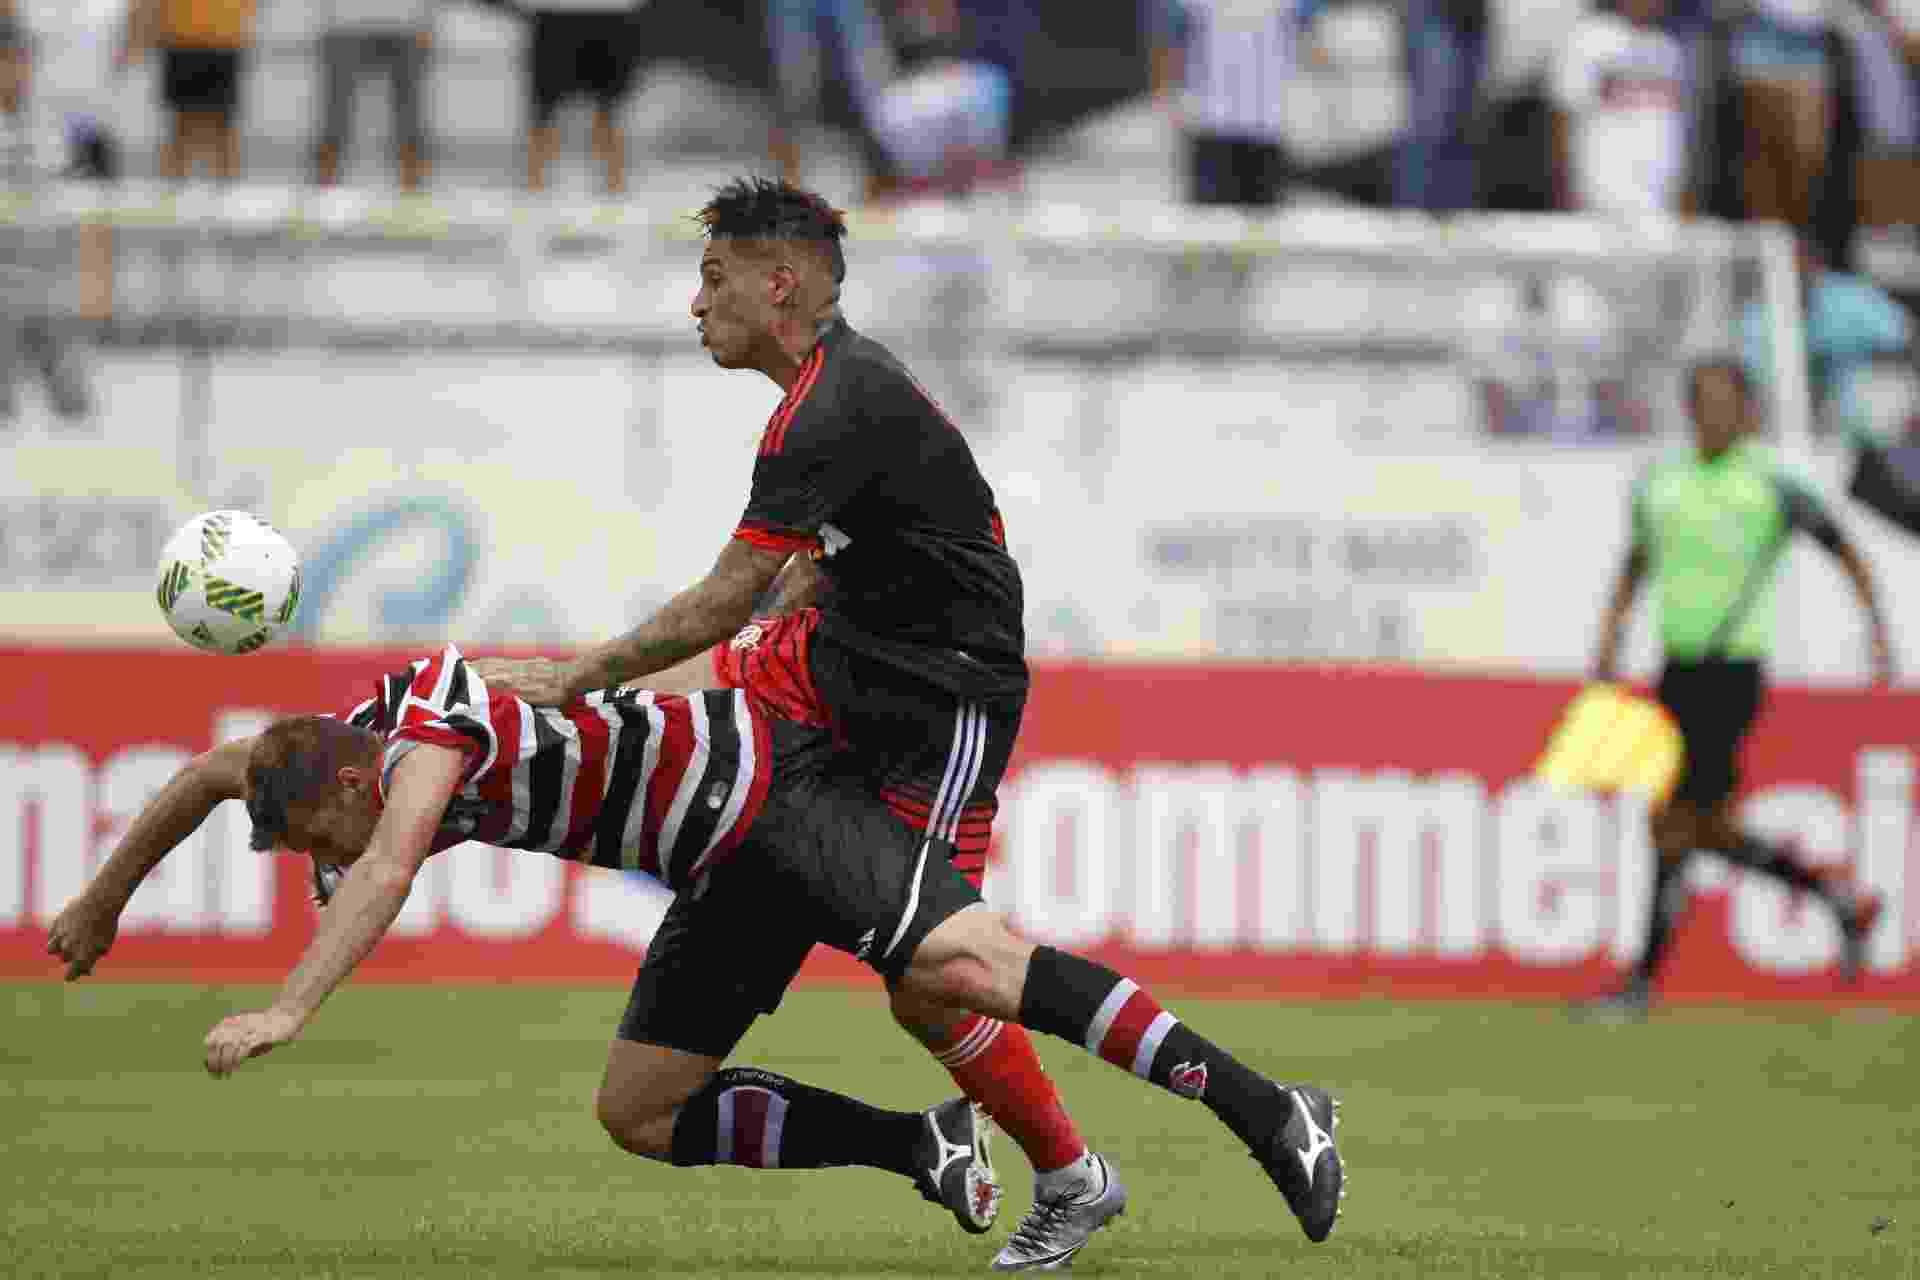 Guerrero derruba o adversário na briga pela bola - Gilvan de Souza / Flamengo